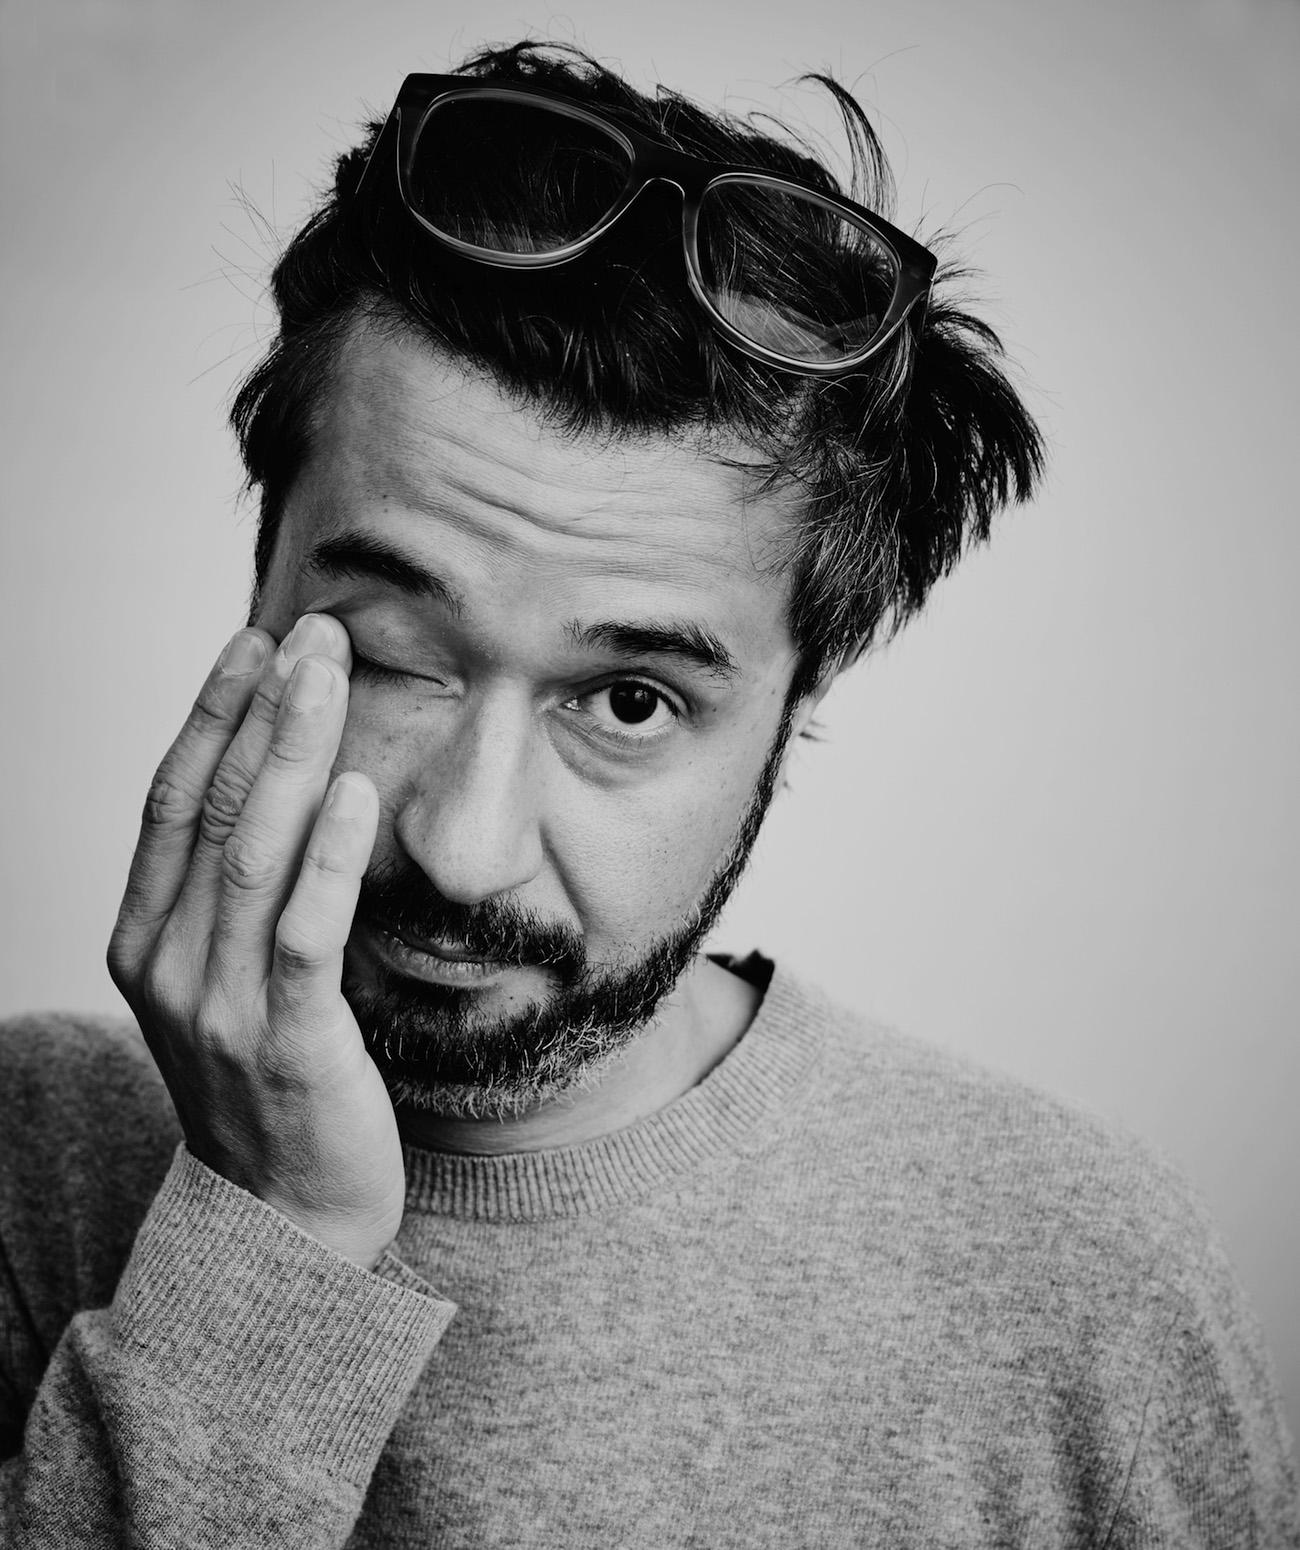 Mario Lombardo im Interview zu Trends & Ästhetik